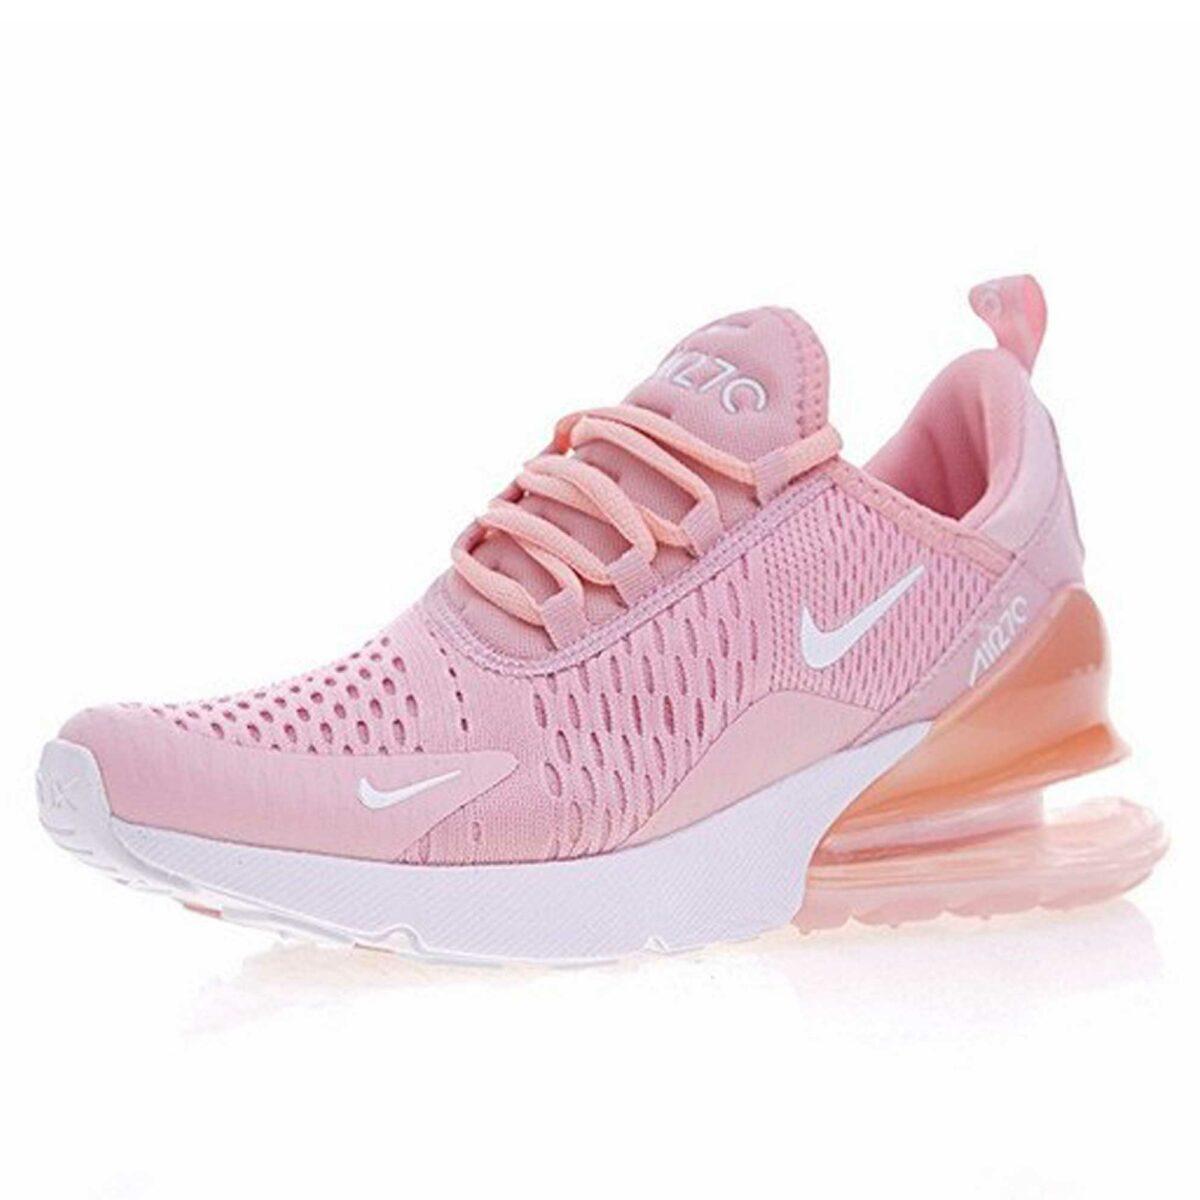 nike air max 270 pink купить